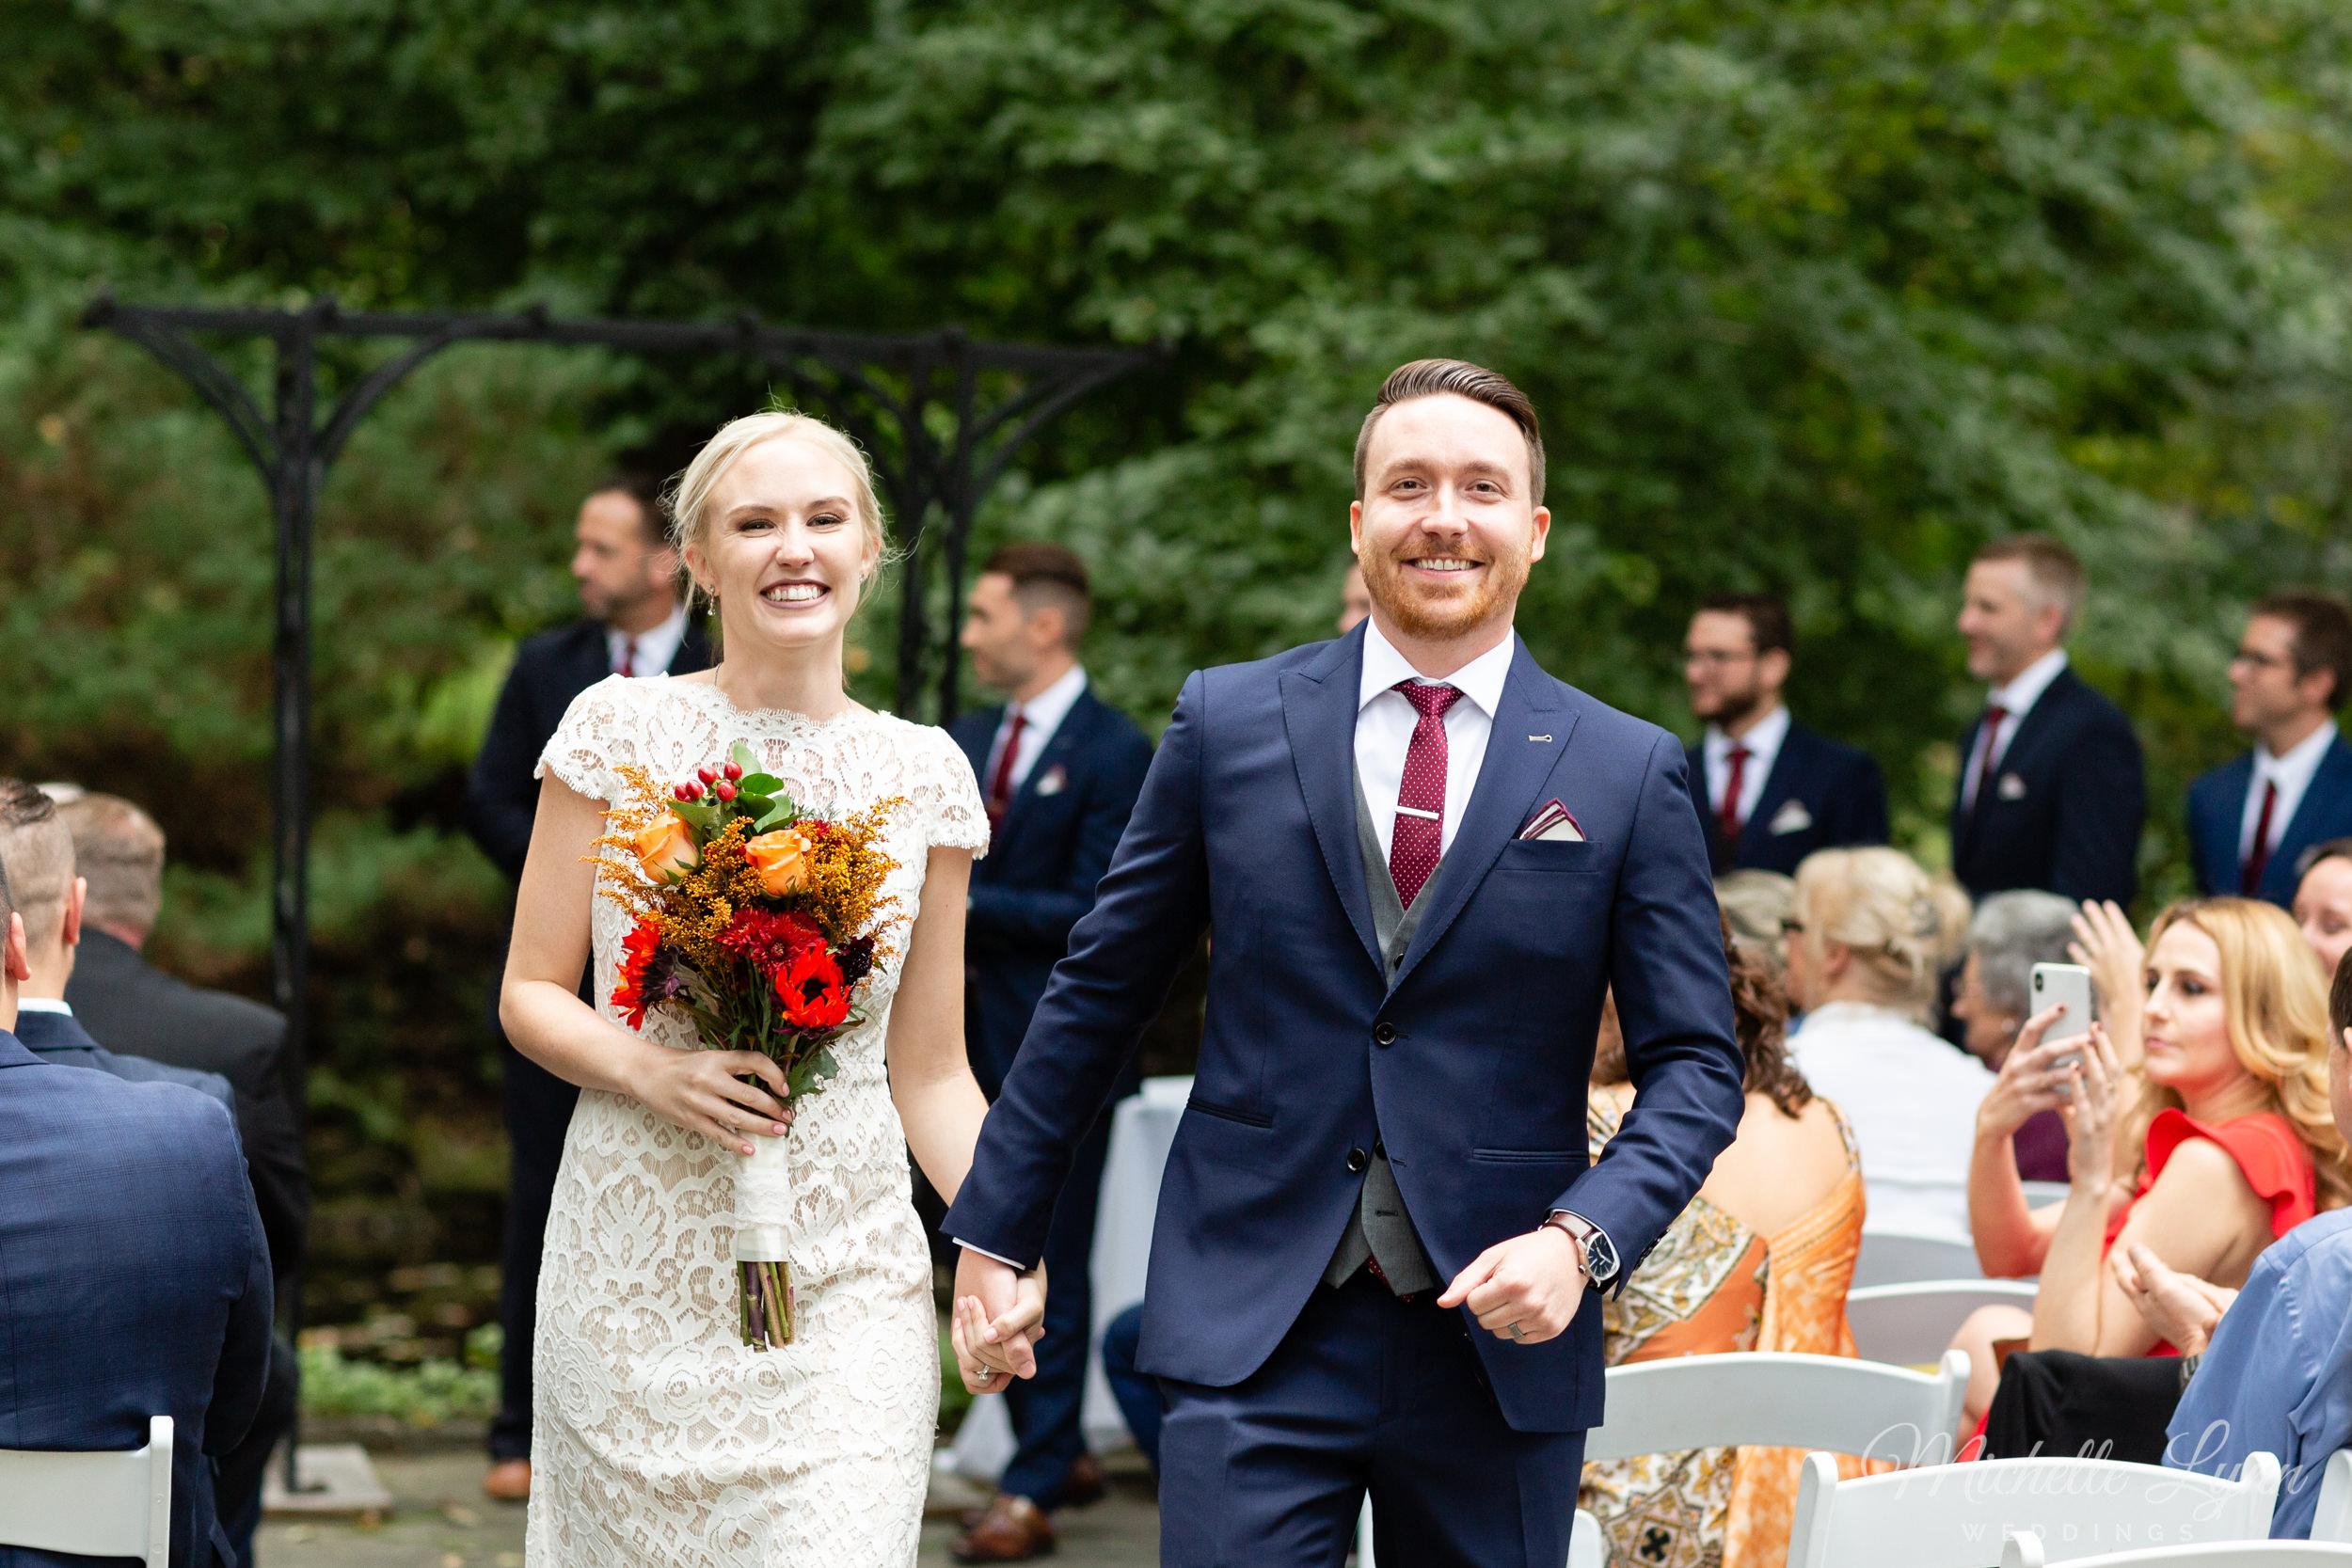 lumberville-general-store-wedding-1.jpg